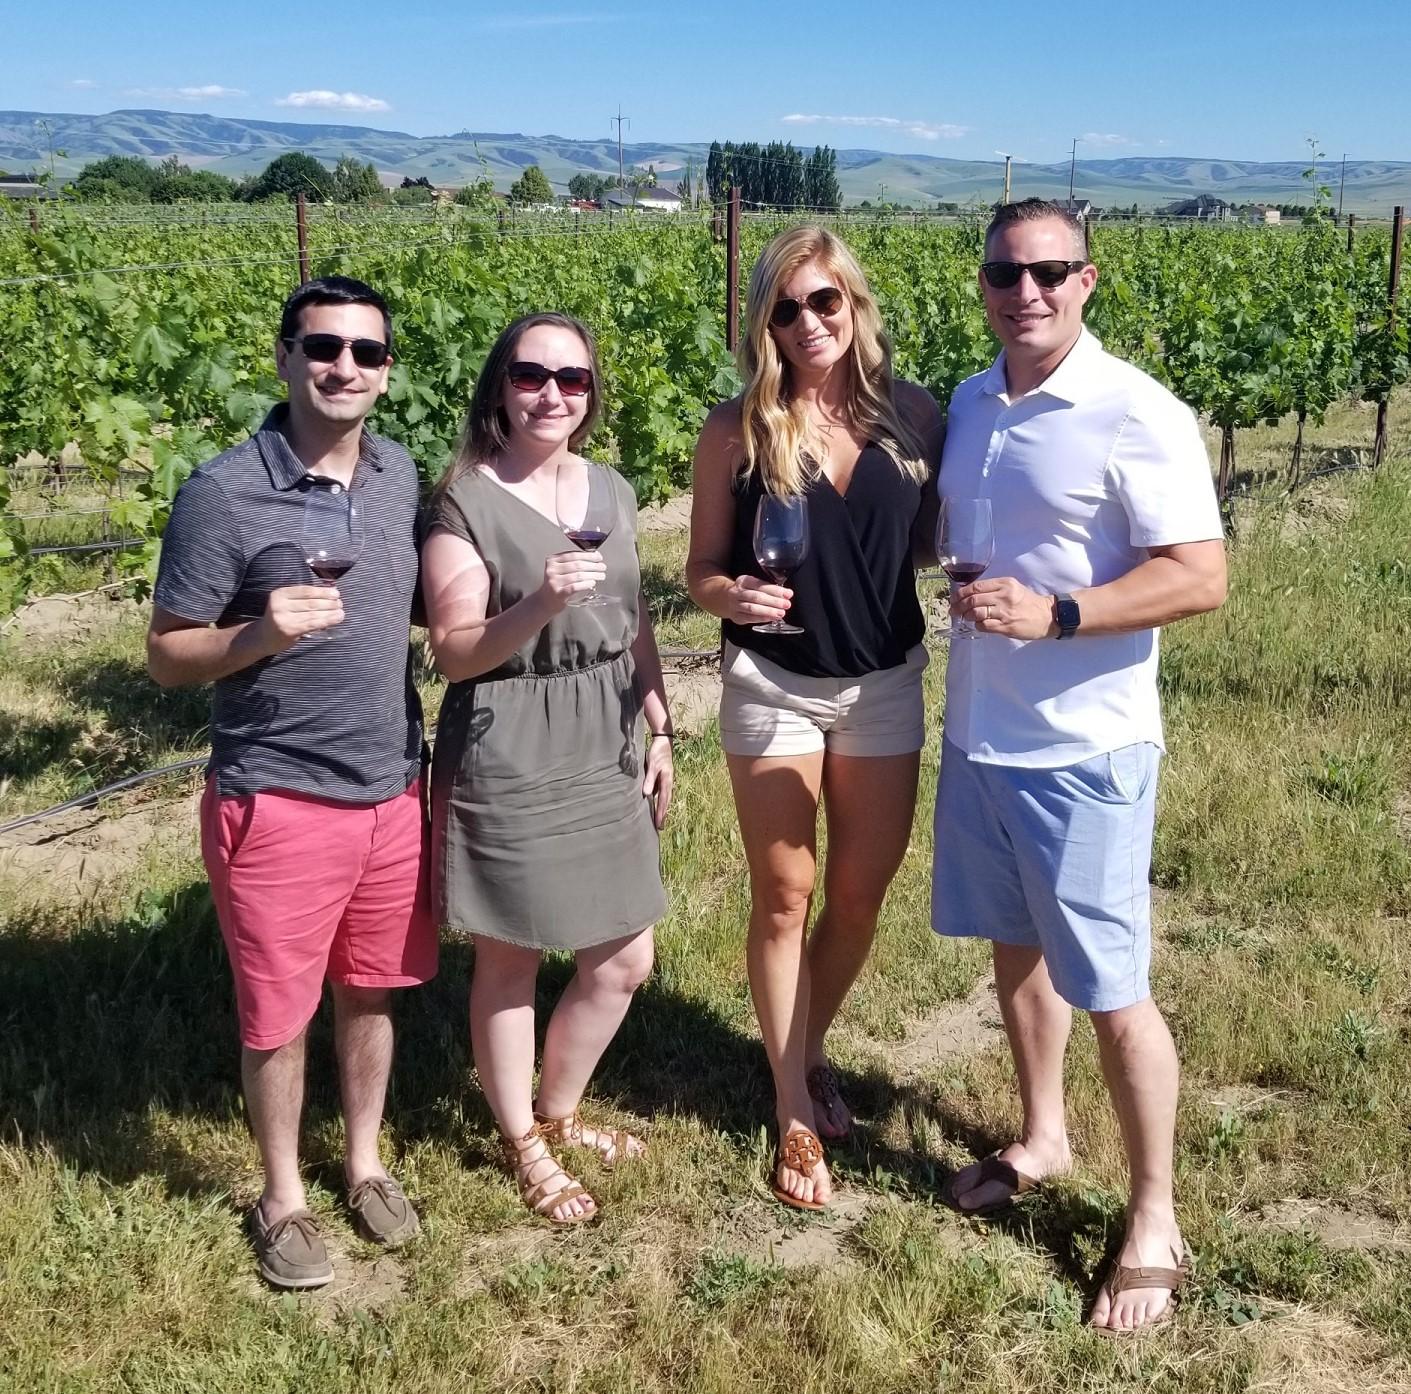 Group wine tasting in vineyard in Walla Walla